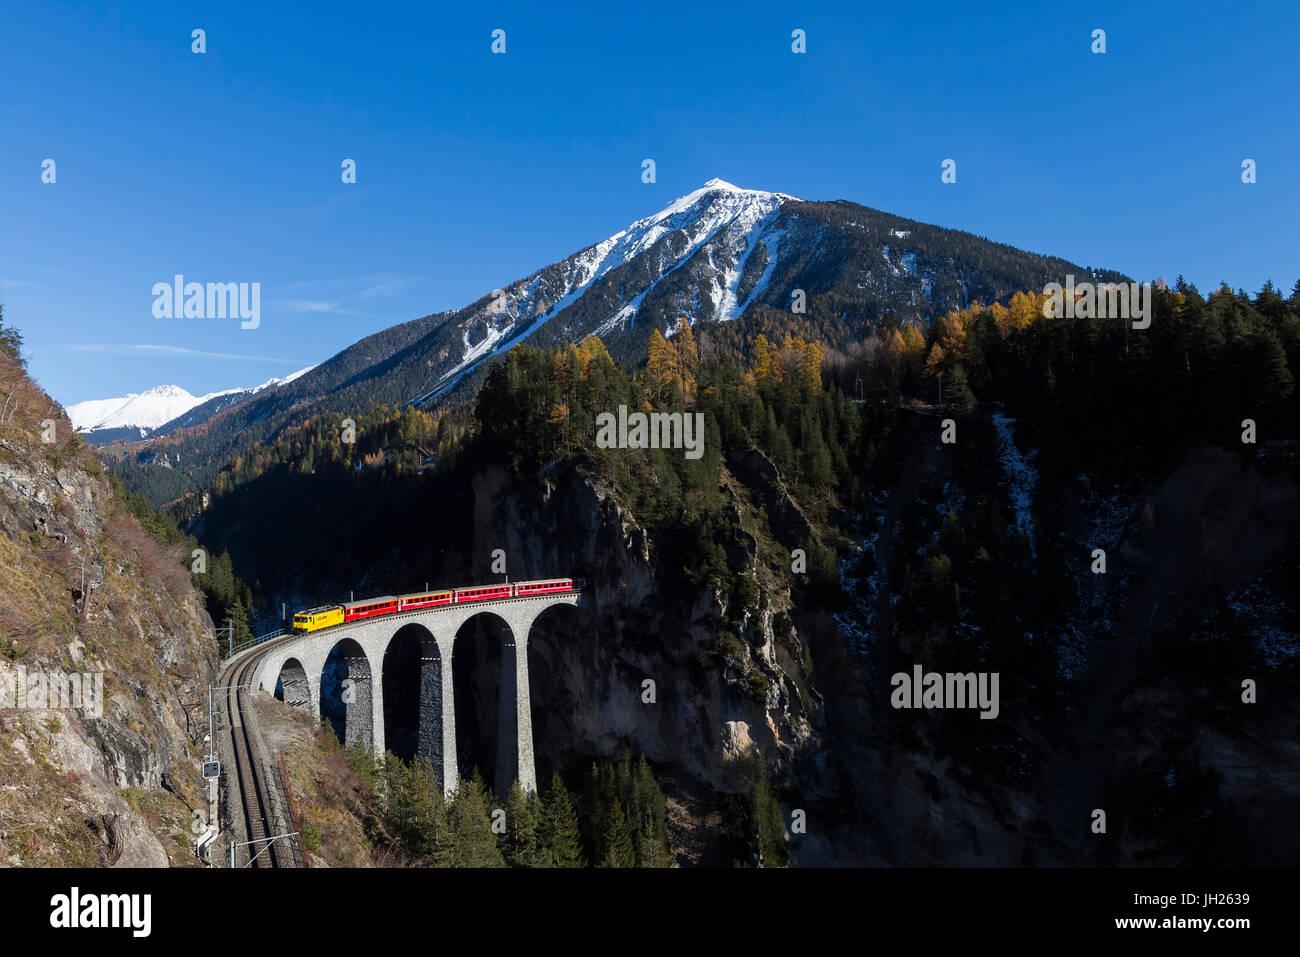 Bernina Express überfährt Landwasser Viadukt umgeben von bunten Wäldern, Kanton Graubünden, Stockbild